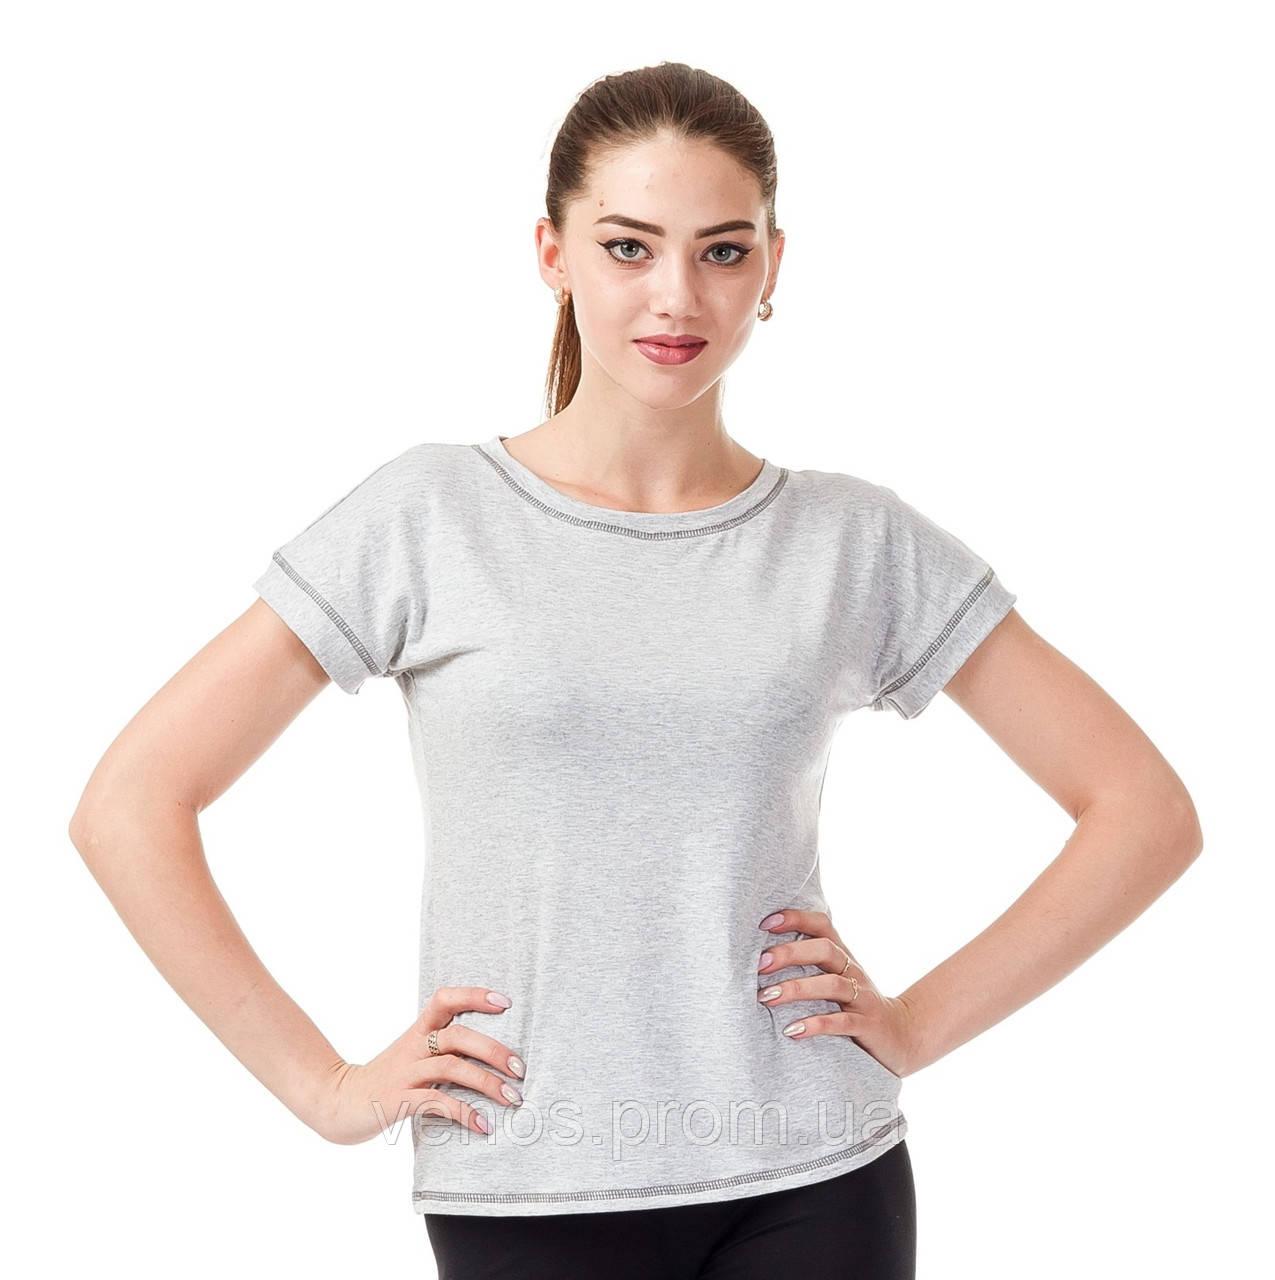 Базовая трикотажная футболка. К081